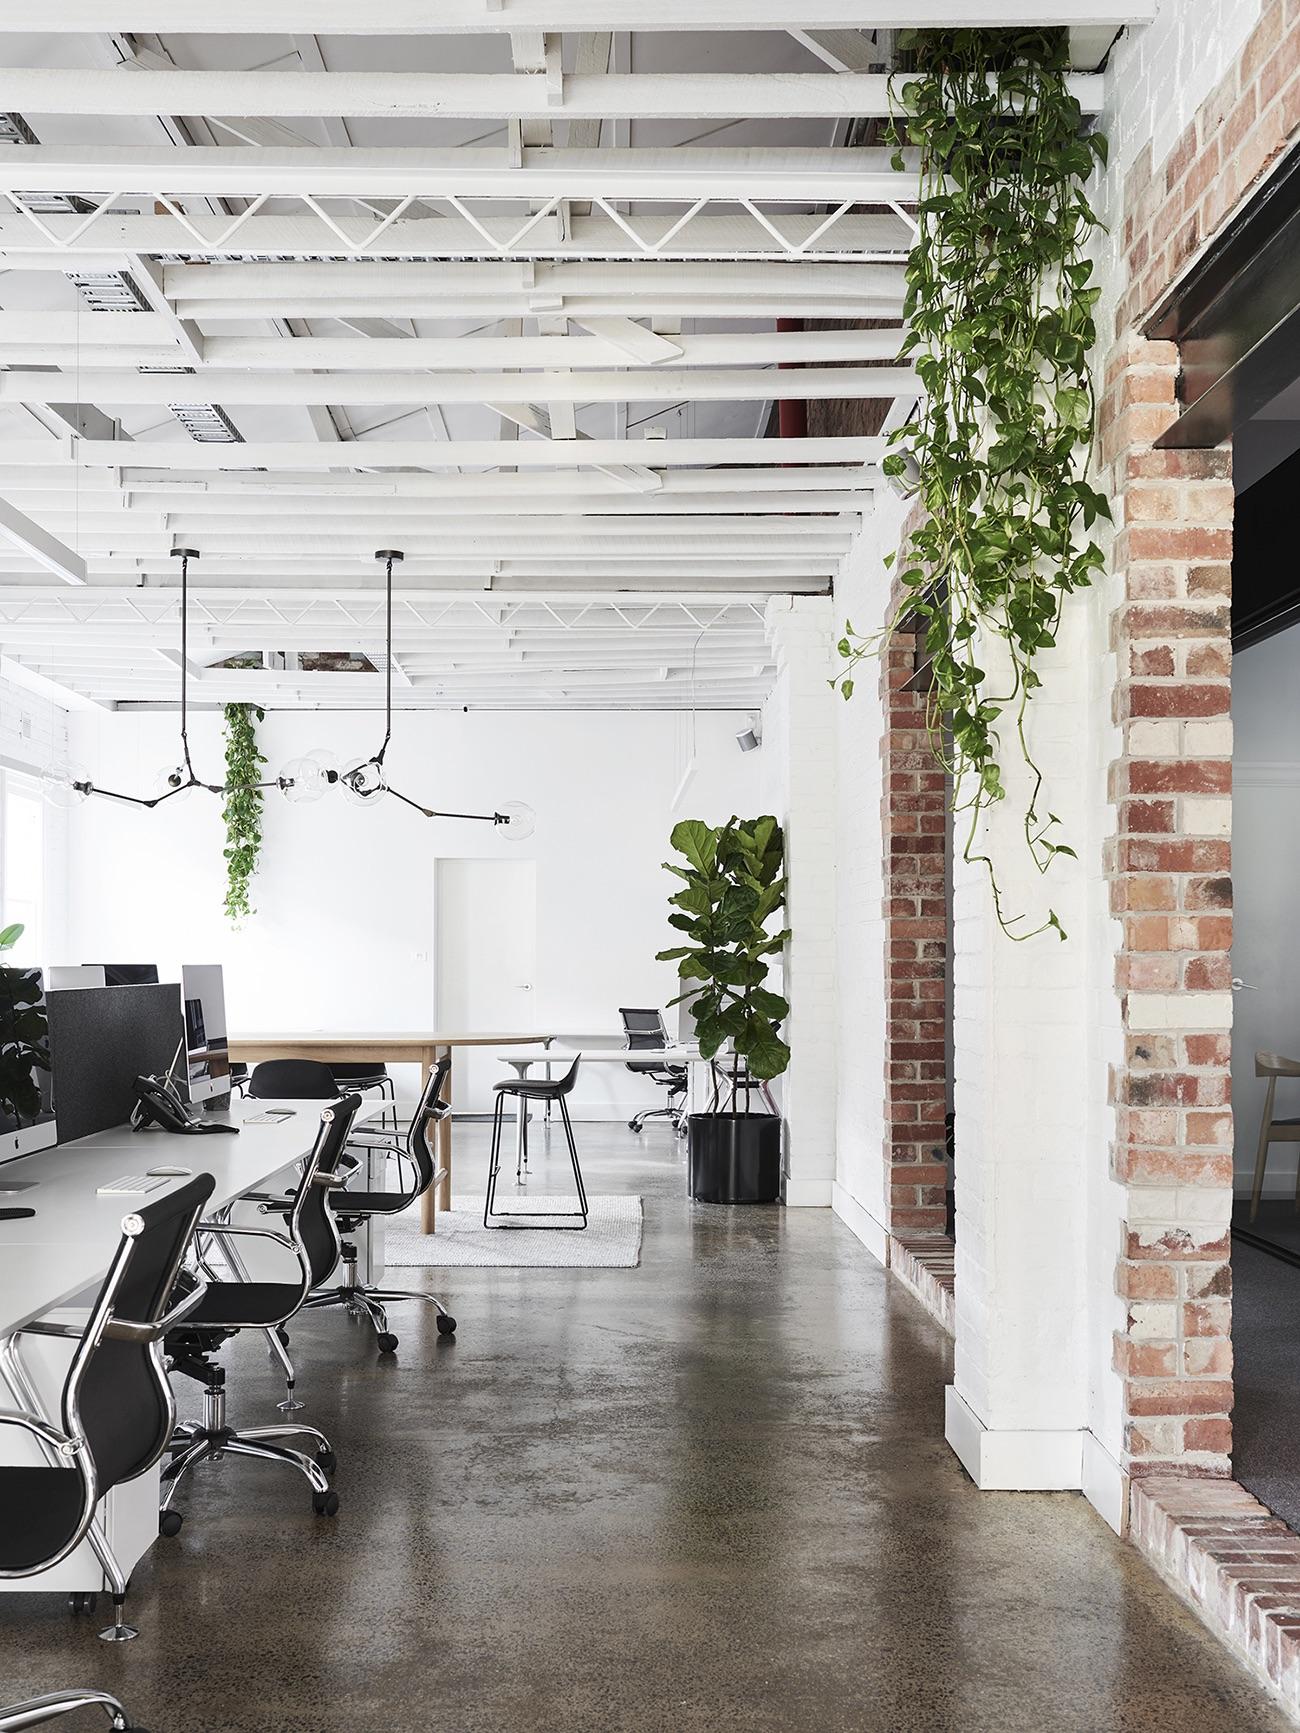 dwa-nbd-studio-office-11